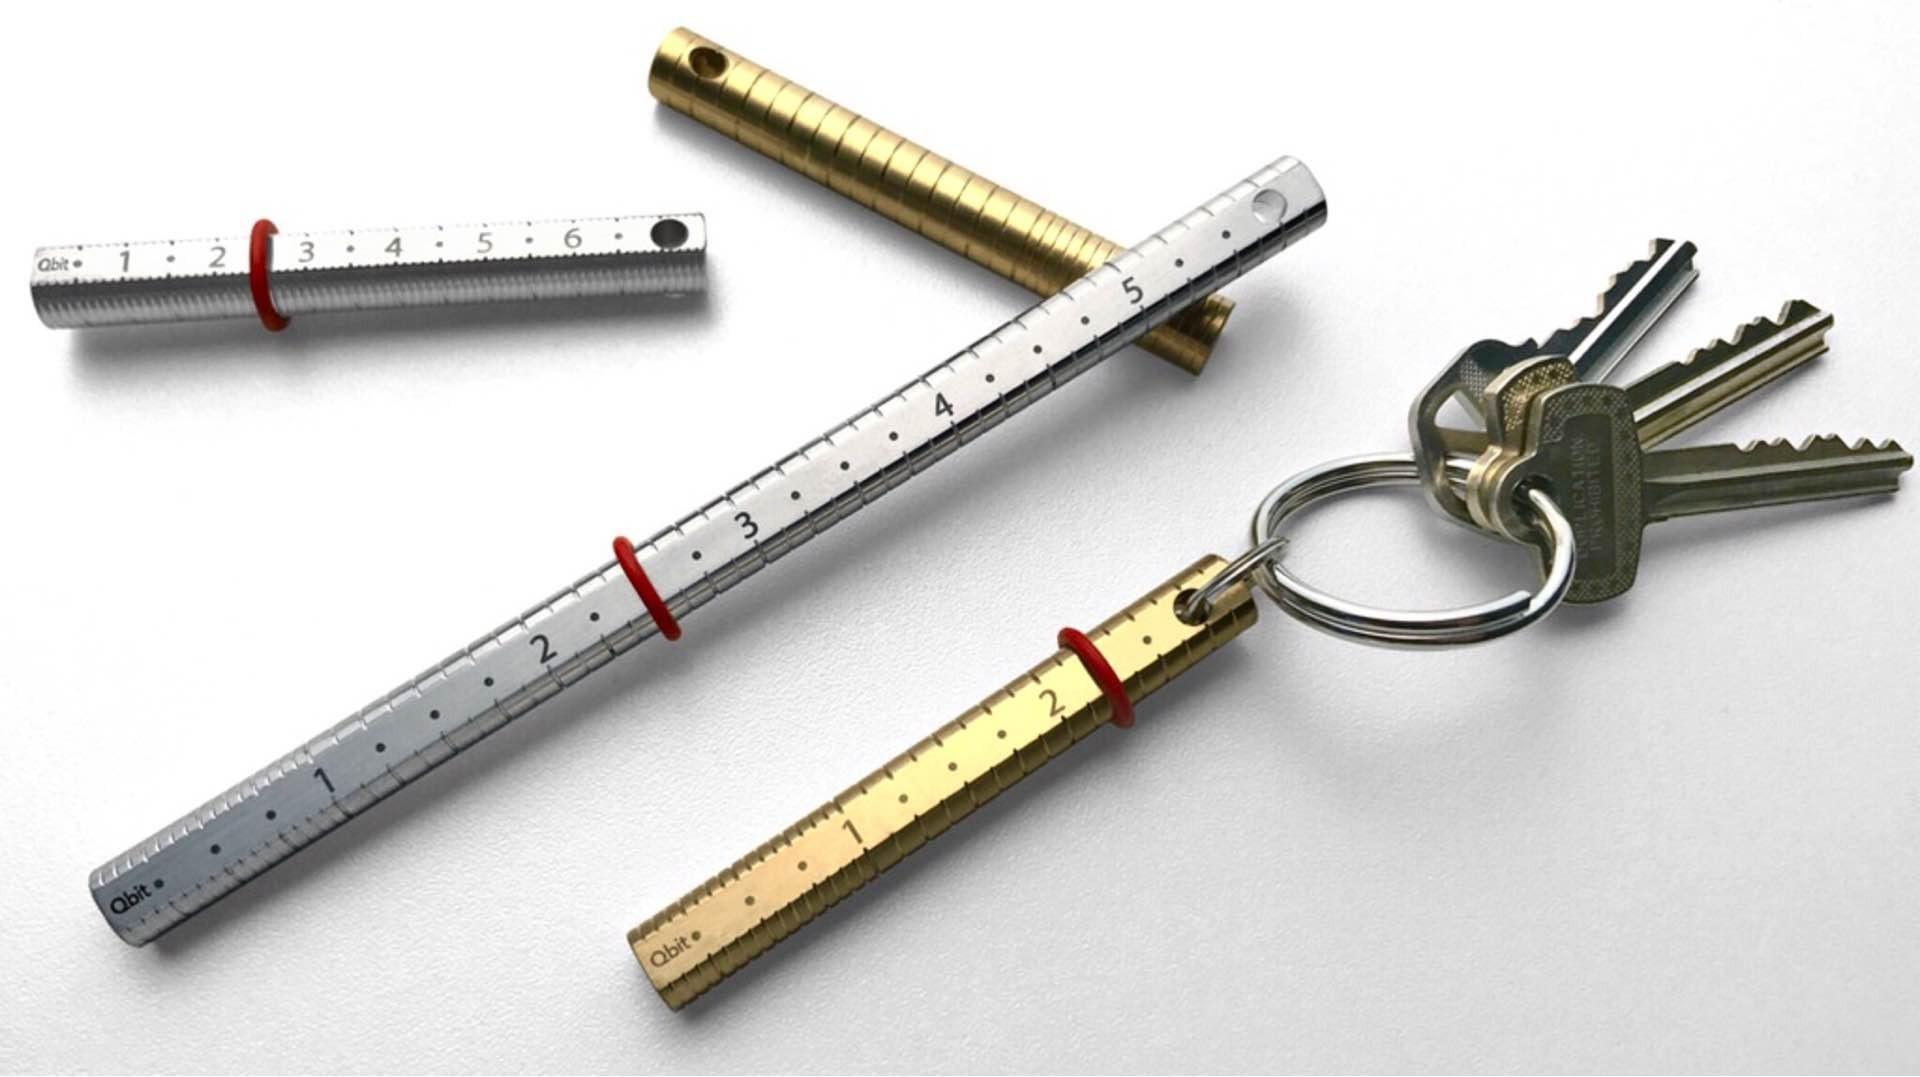 qbit-portable-measuring-tool